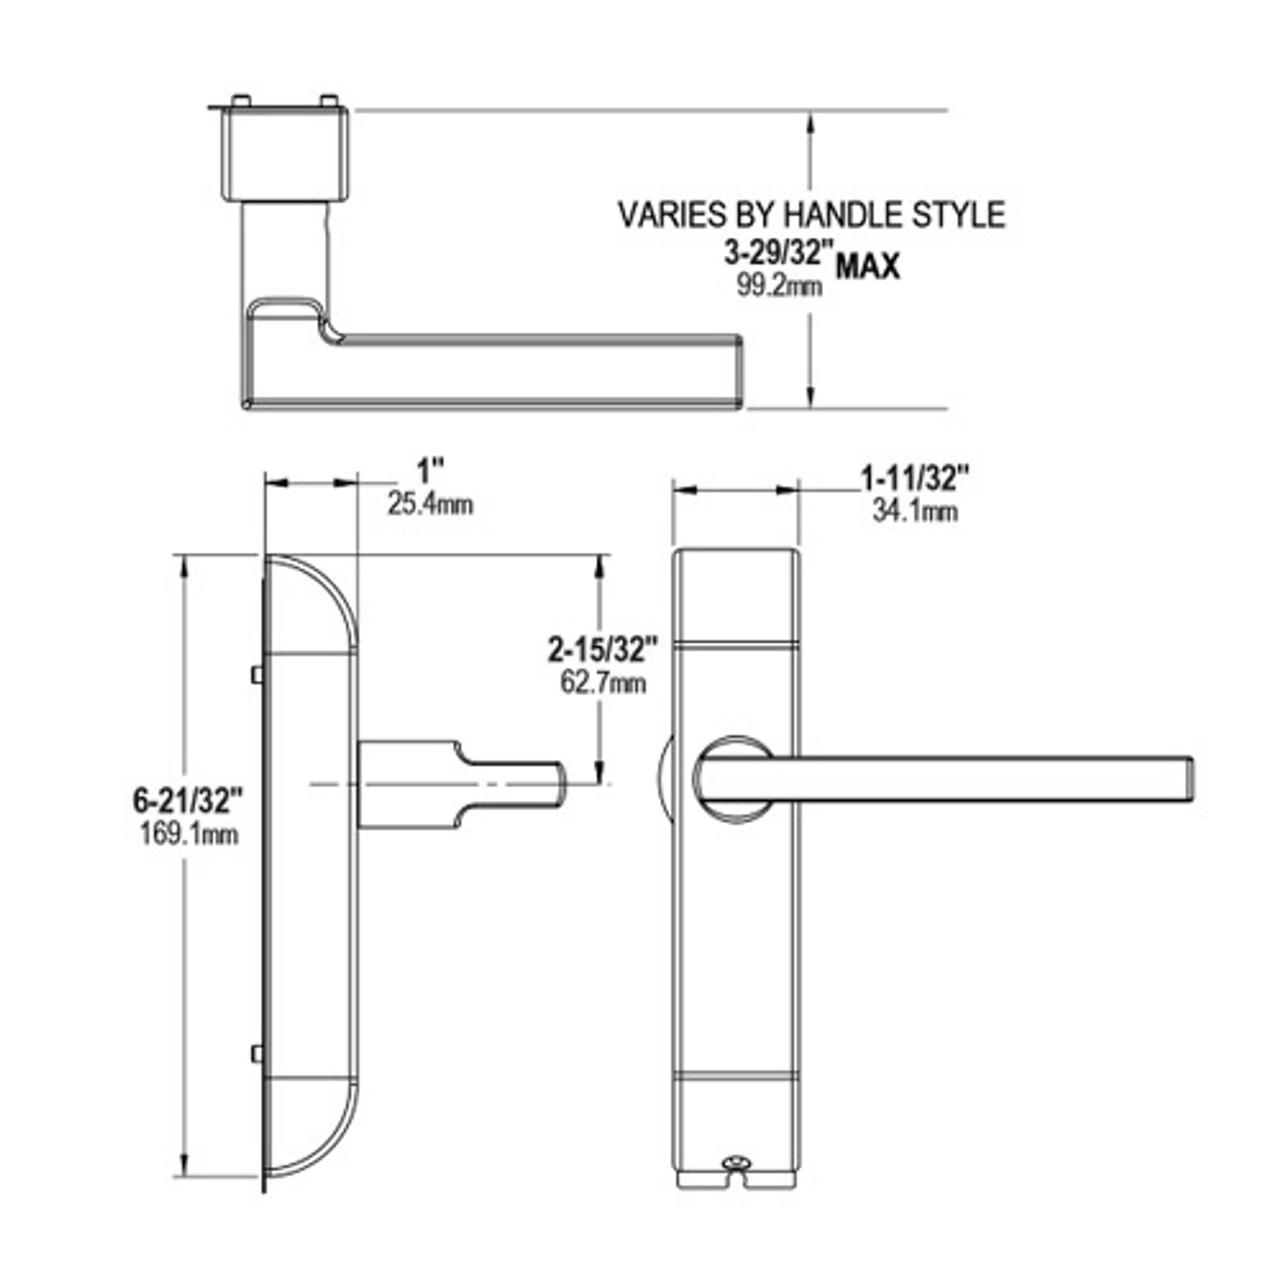 4600-MI-632-US32 Adams Rite MI Designer handle Dimensional View